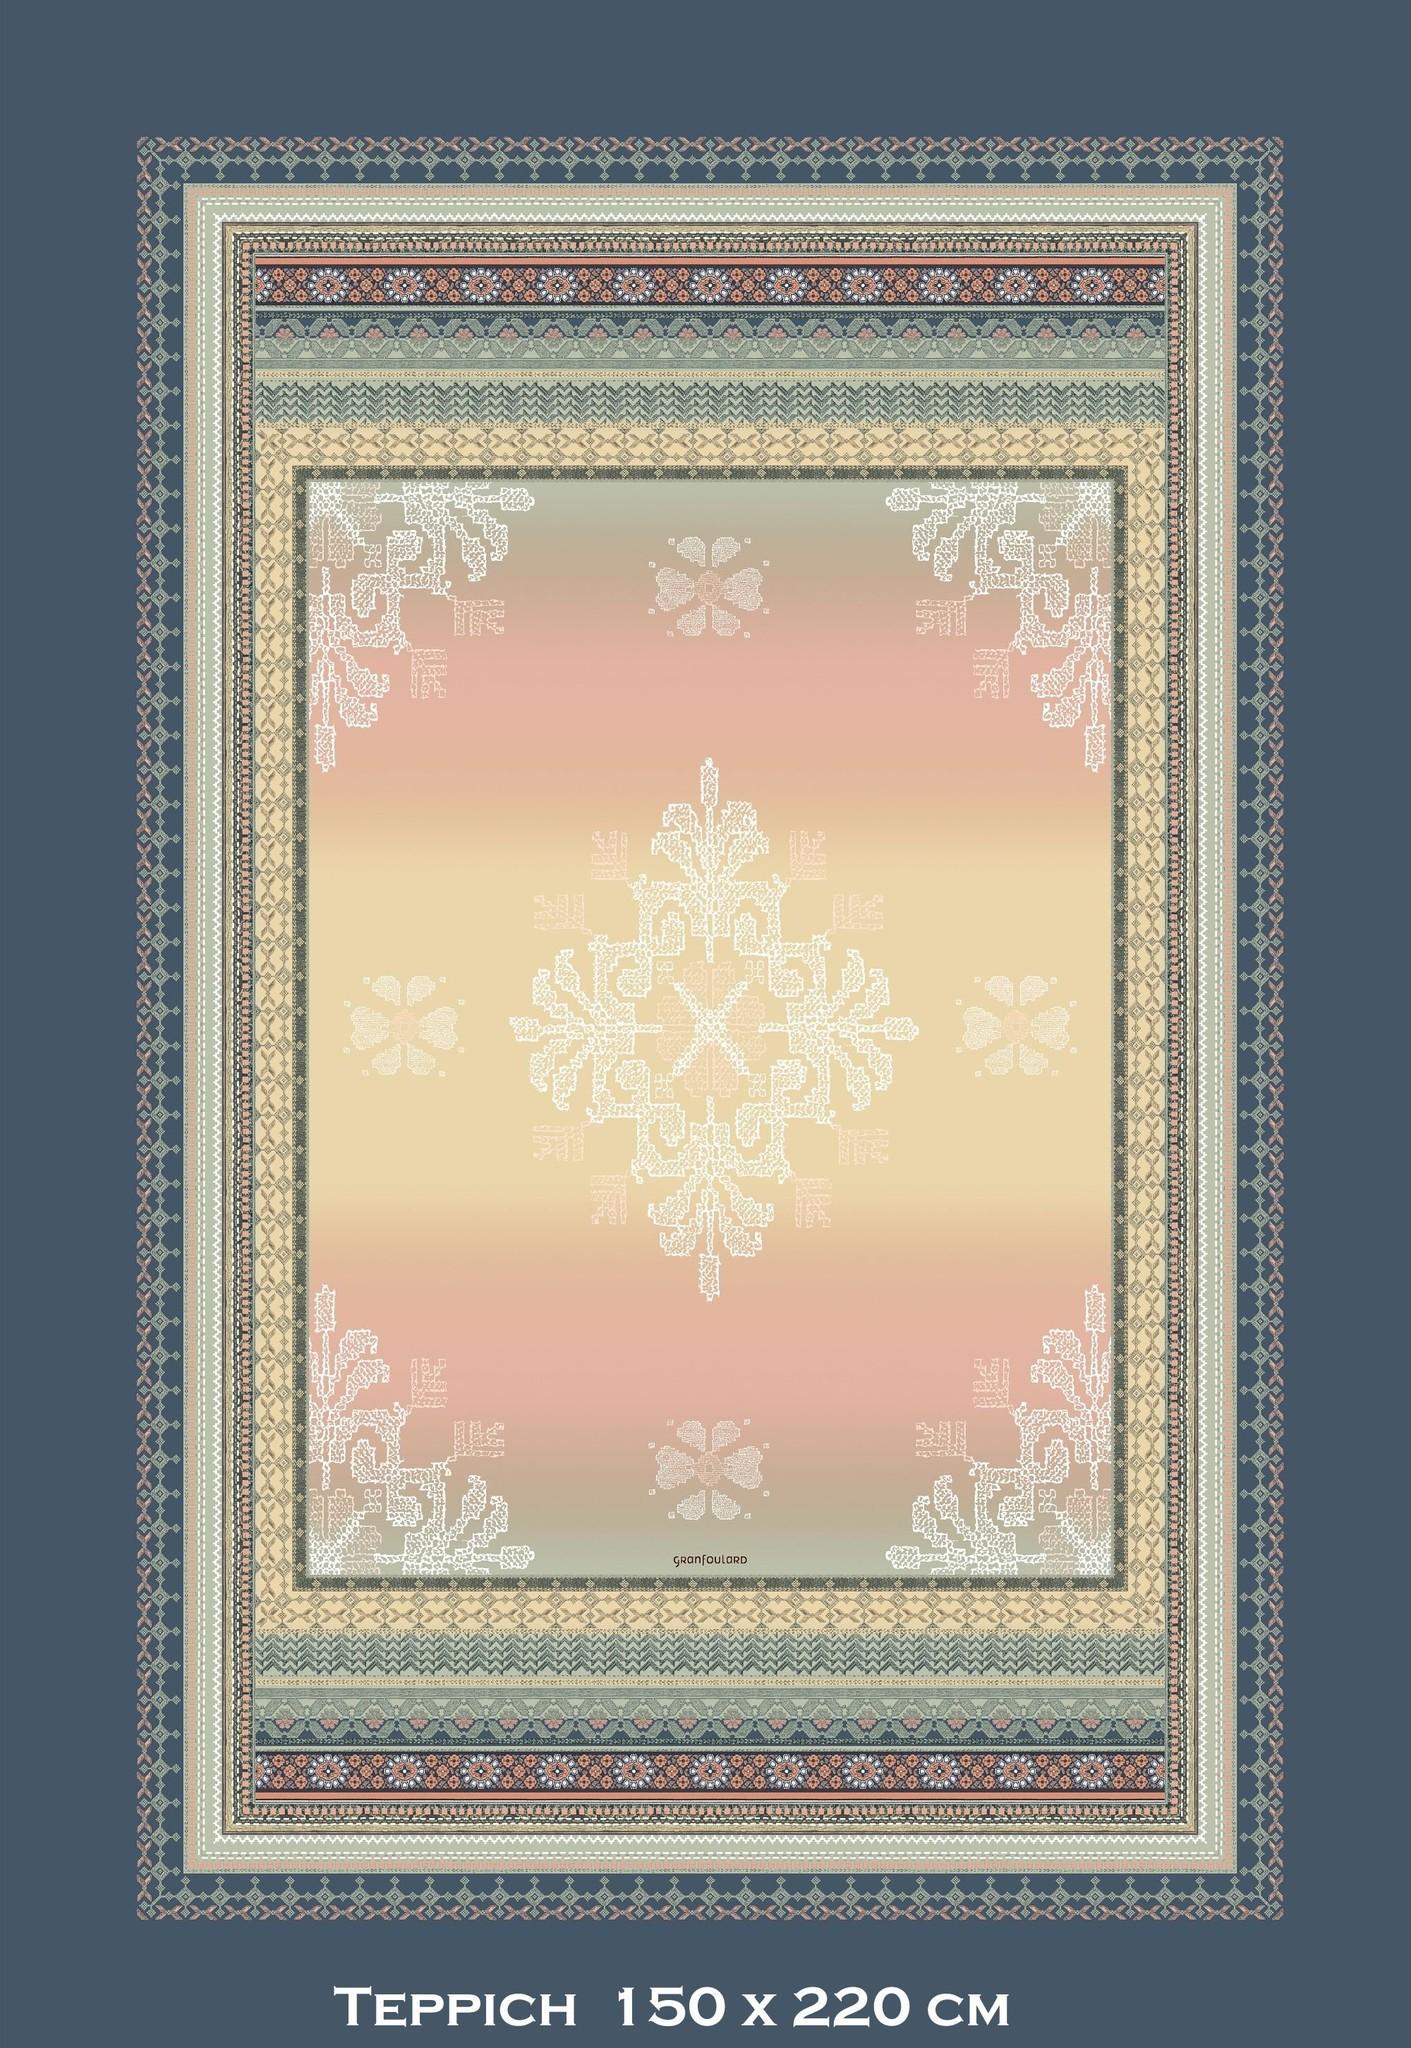 Lavare Tappeto Lana Ikea modern carpet bassetti granfoulard olbia 41 non-slip